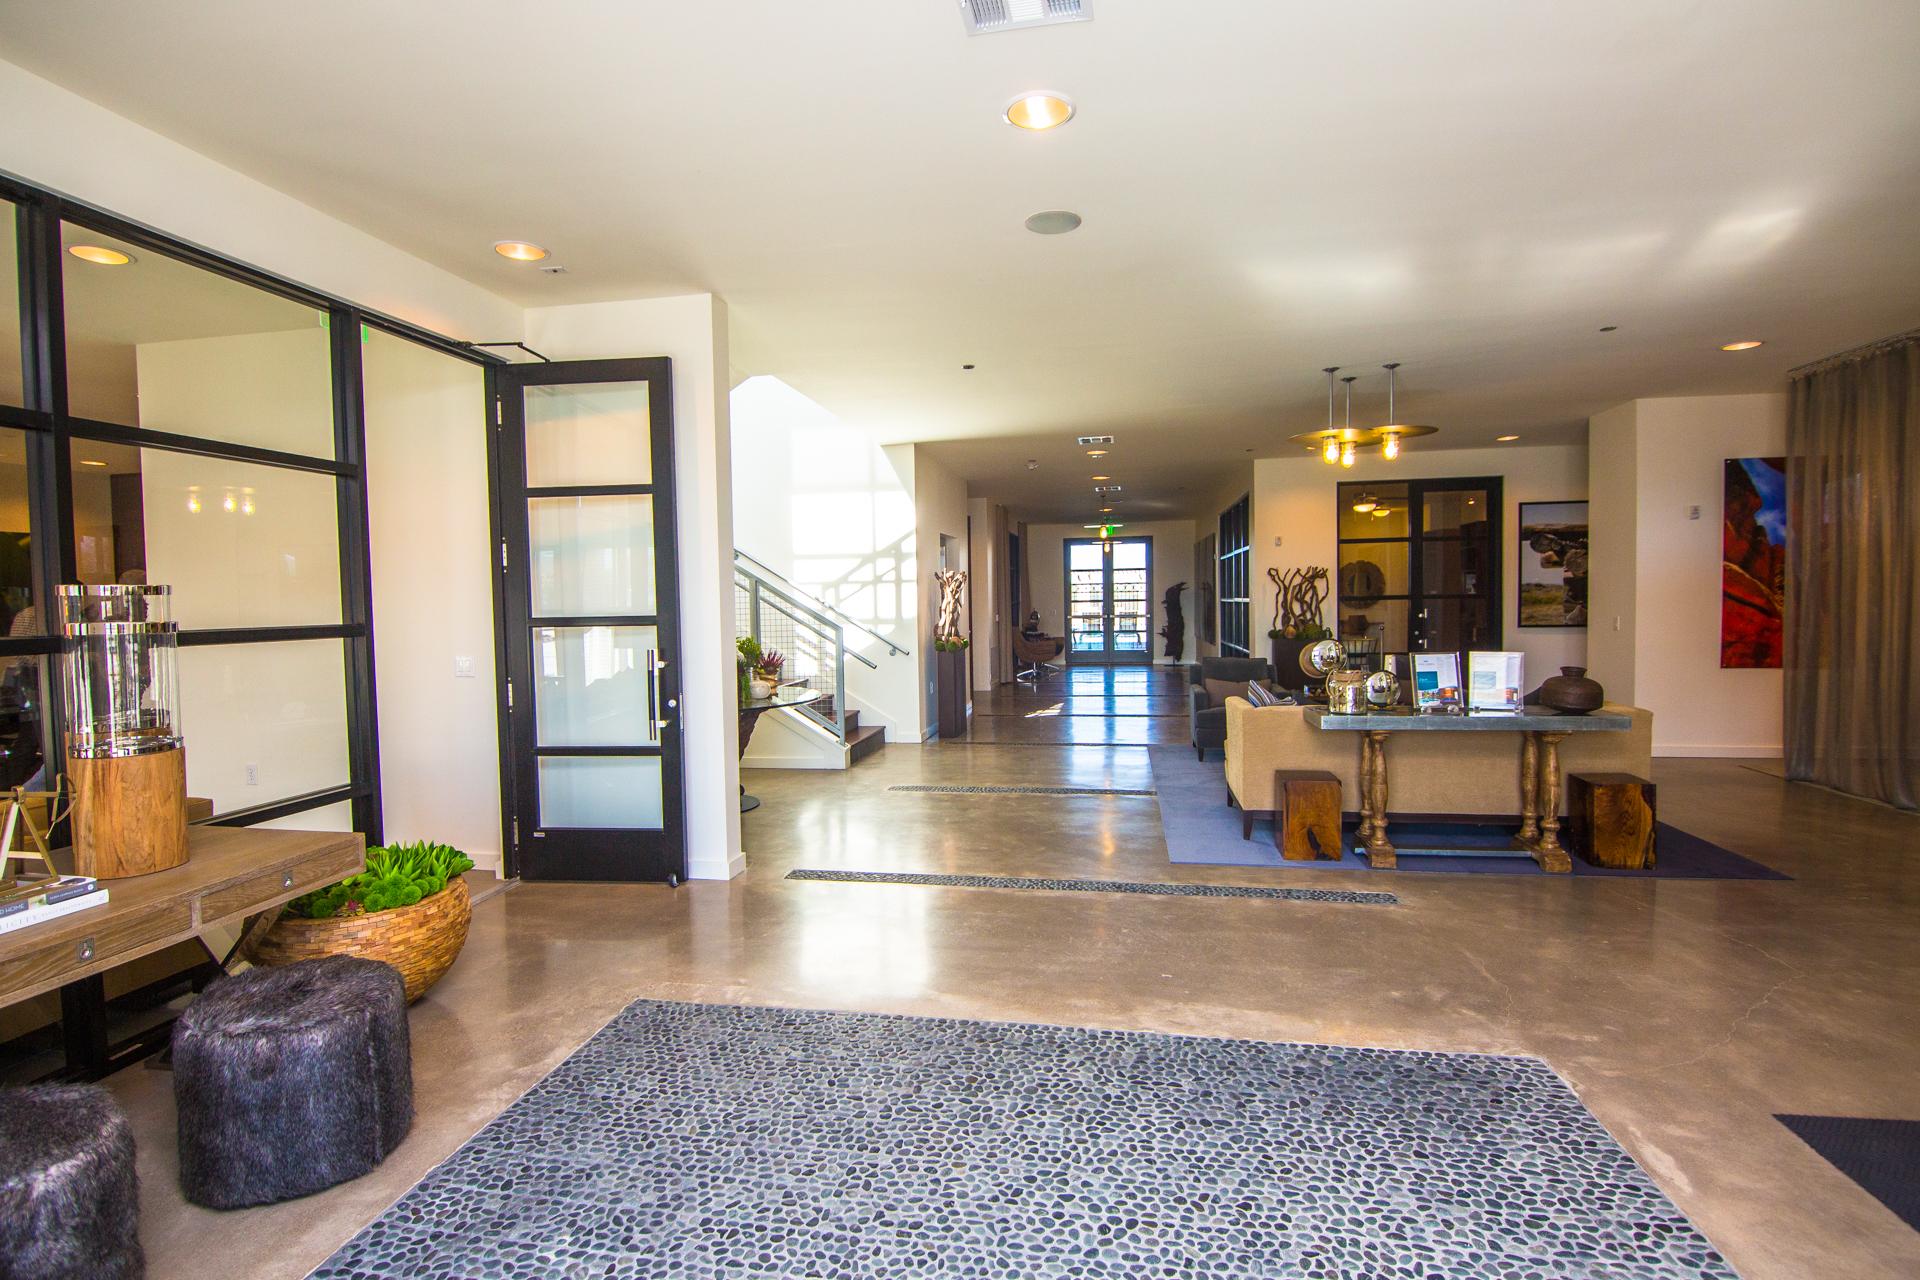 2015-03-26-Twin Creeks Apartments web-9.jpg